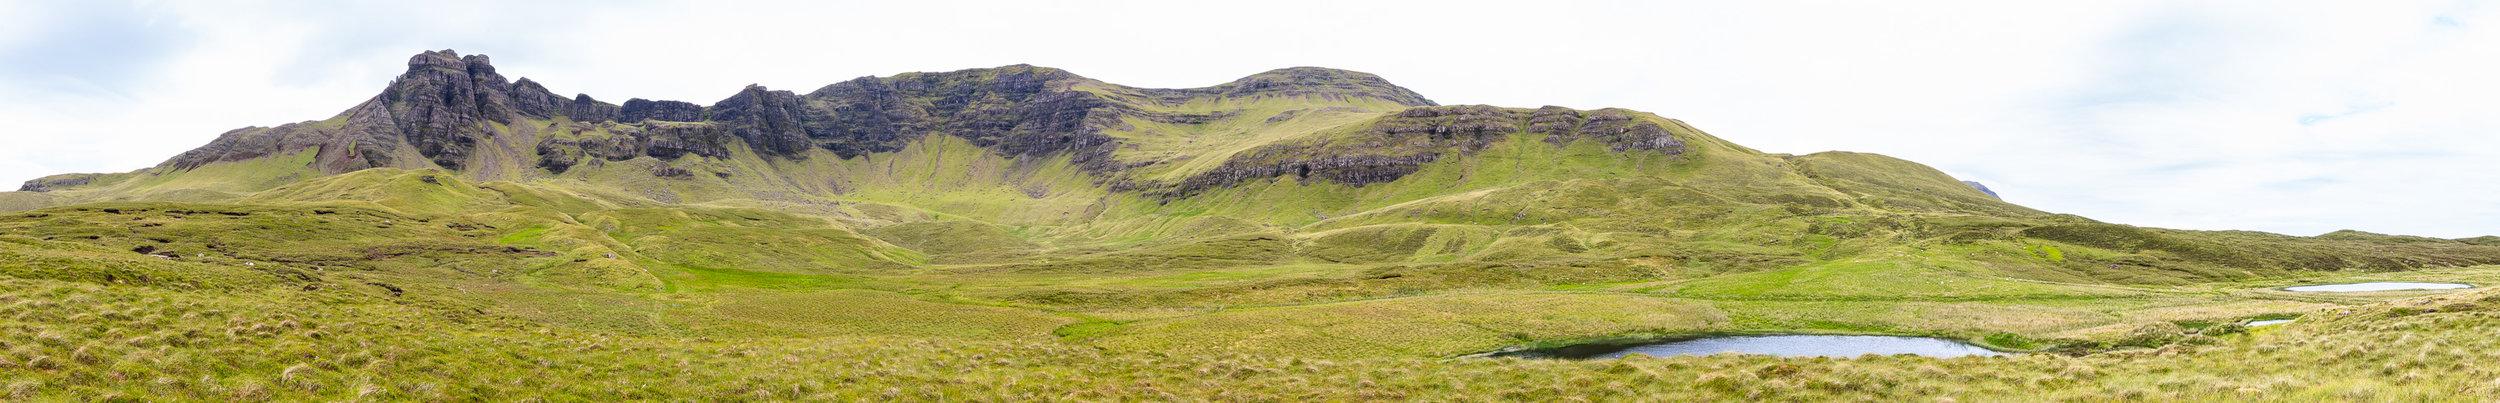 Trotternish Ridge from Loch Cuithir in the Lealt Valley , Isle of Skye